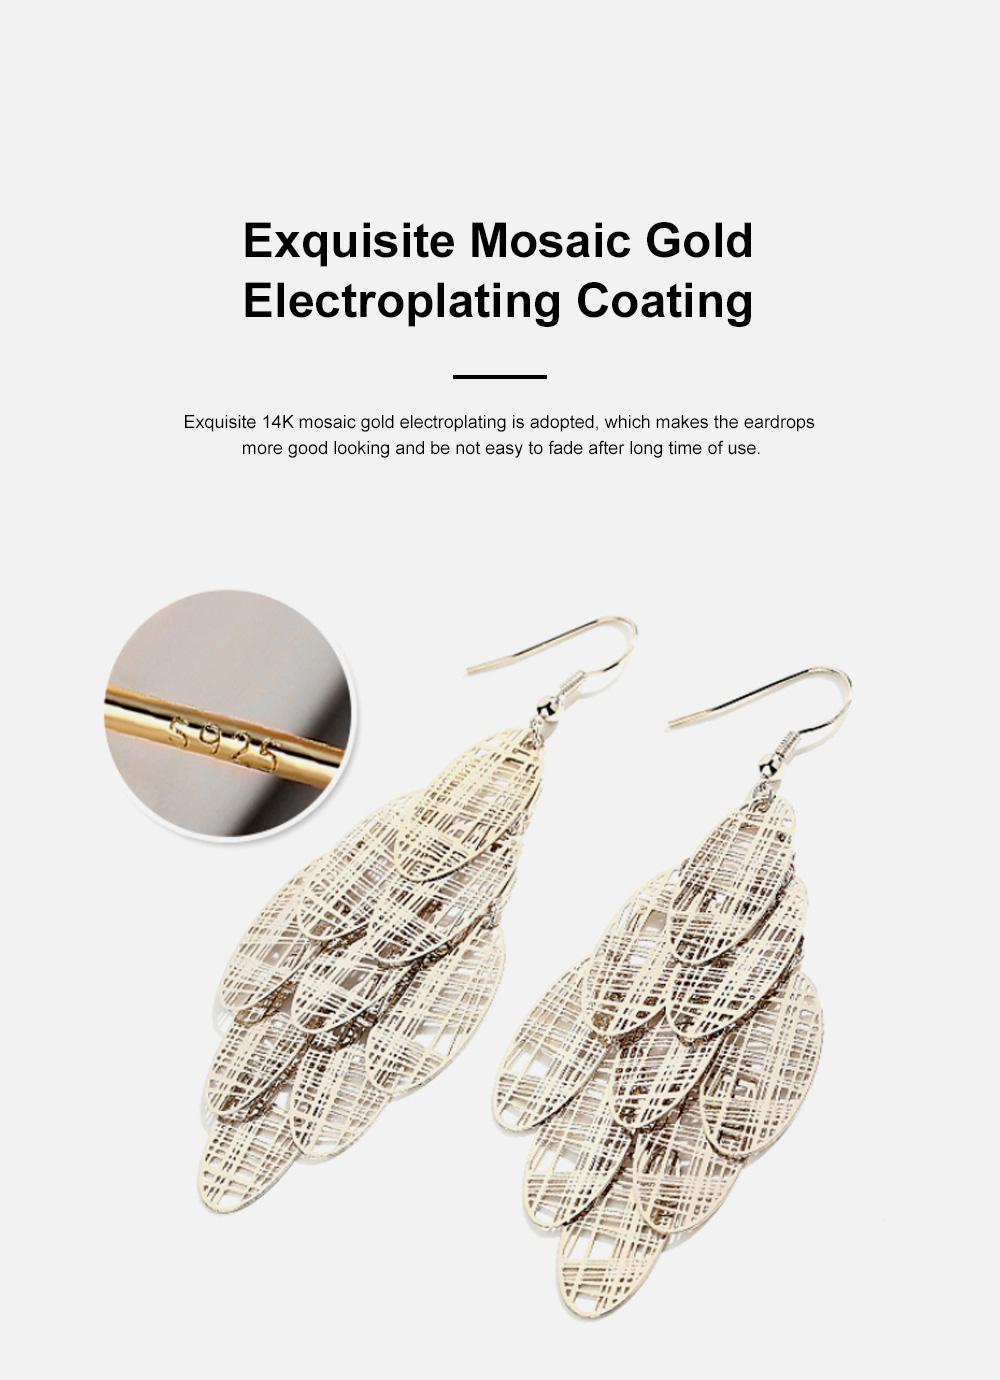 CAROMAY Stylish Elegant Vintage Delicate Hollow Leaf Model Tassels Silver Eardrops Earrings with Mirror Polishing Electroplating 5